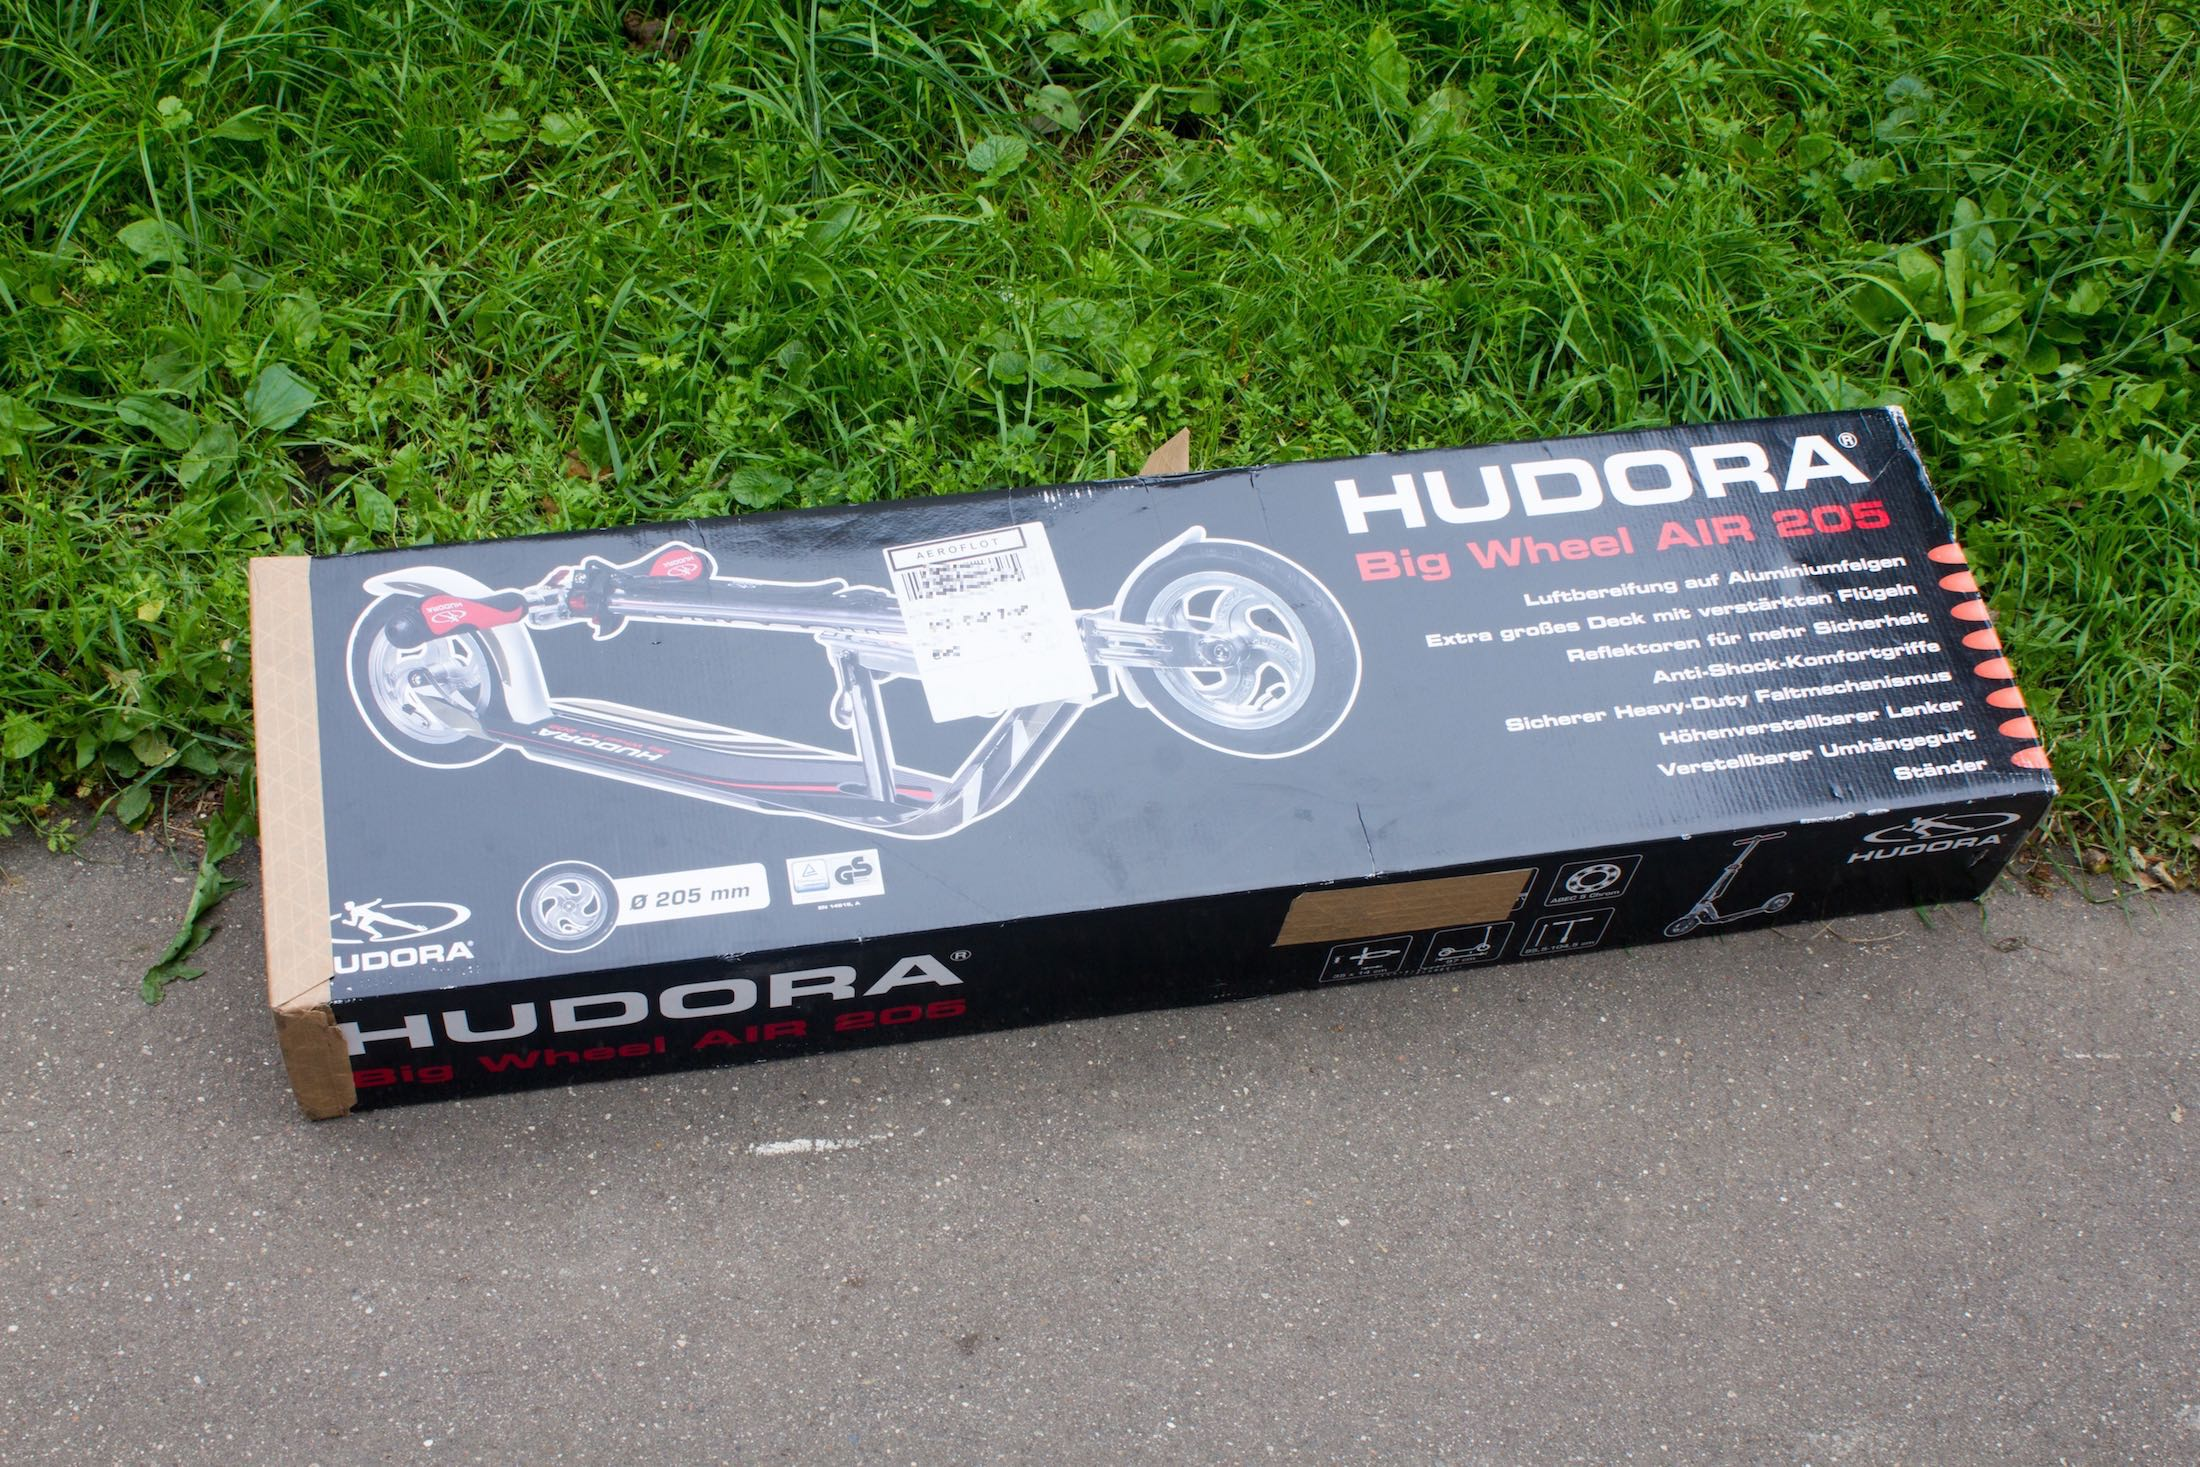 Hudora Big Wheel Air 205 Russia Review 39